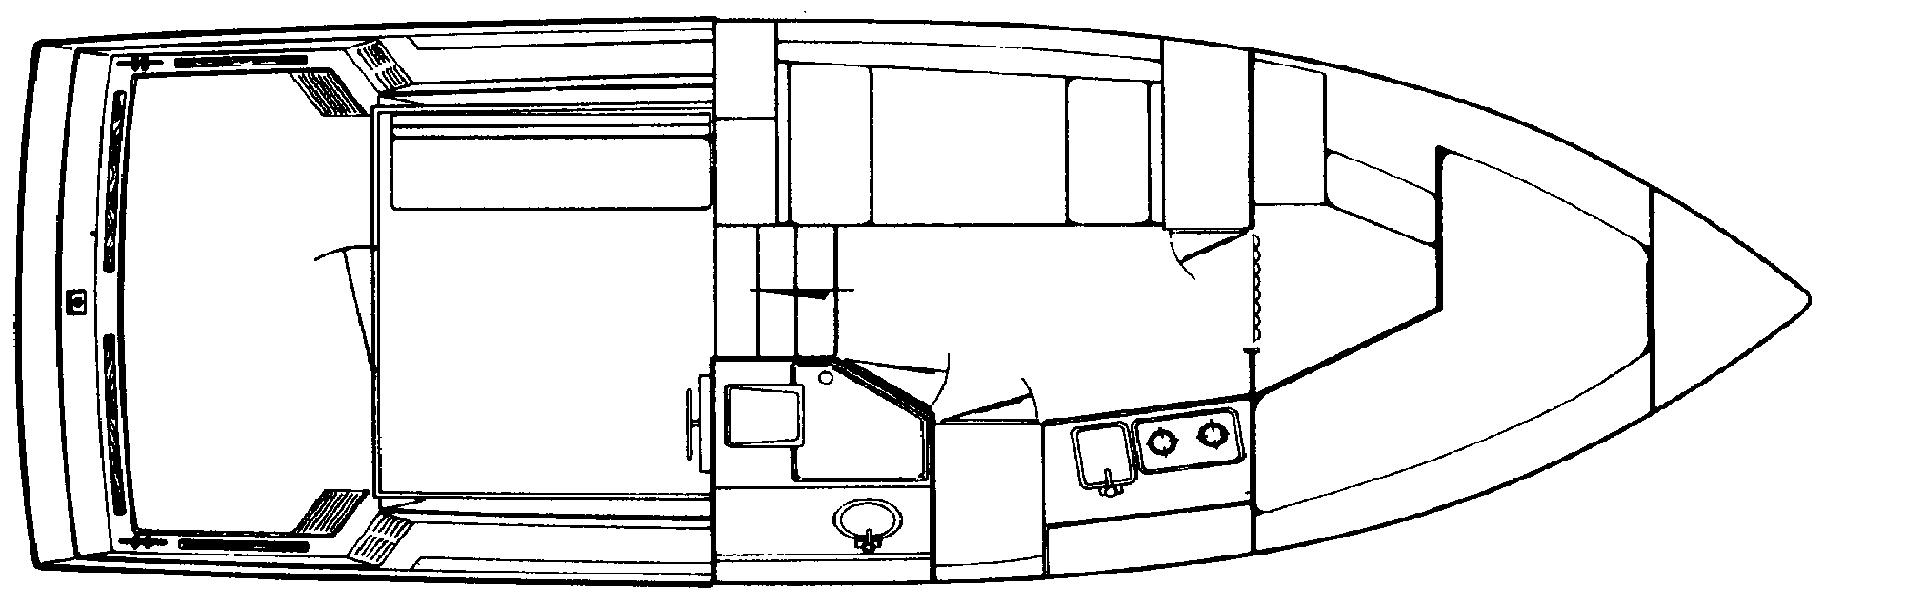 333 Sedan Floor Plan 2